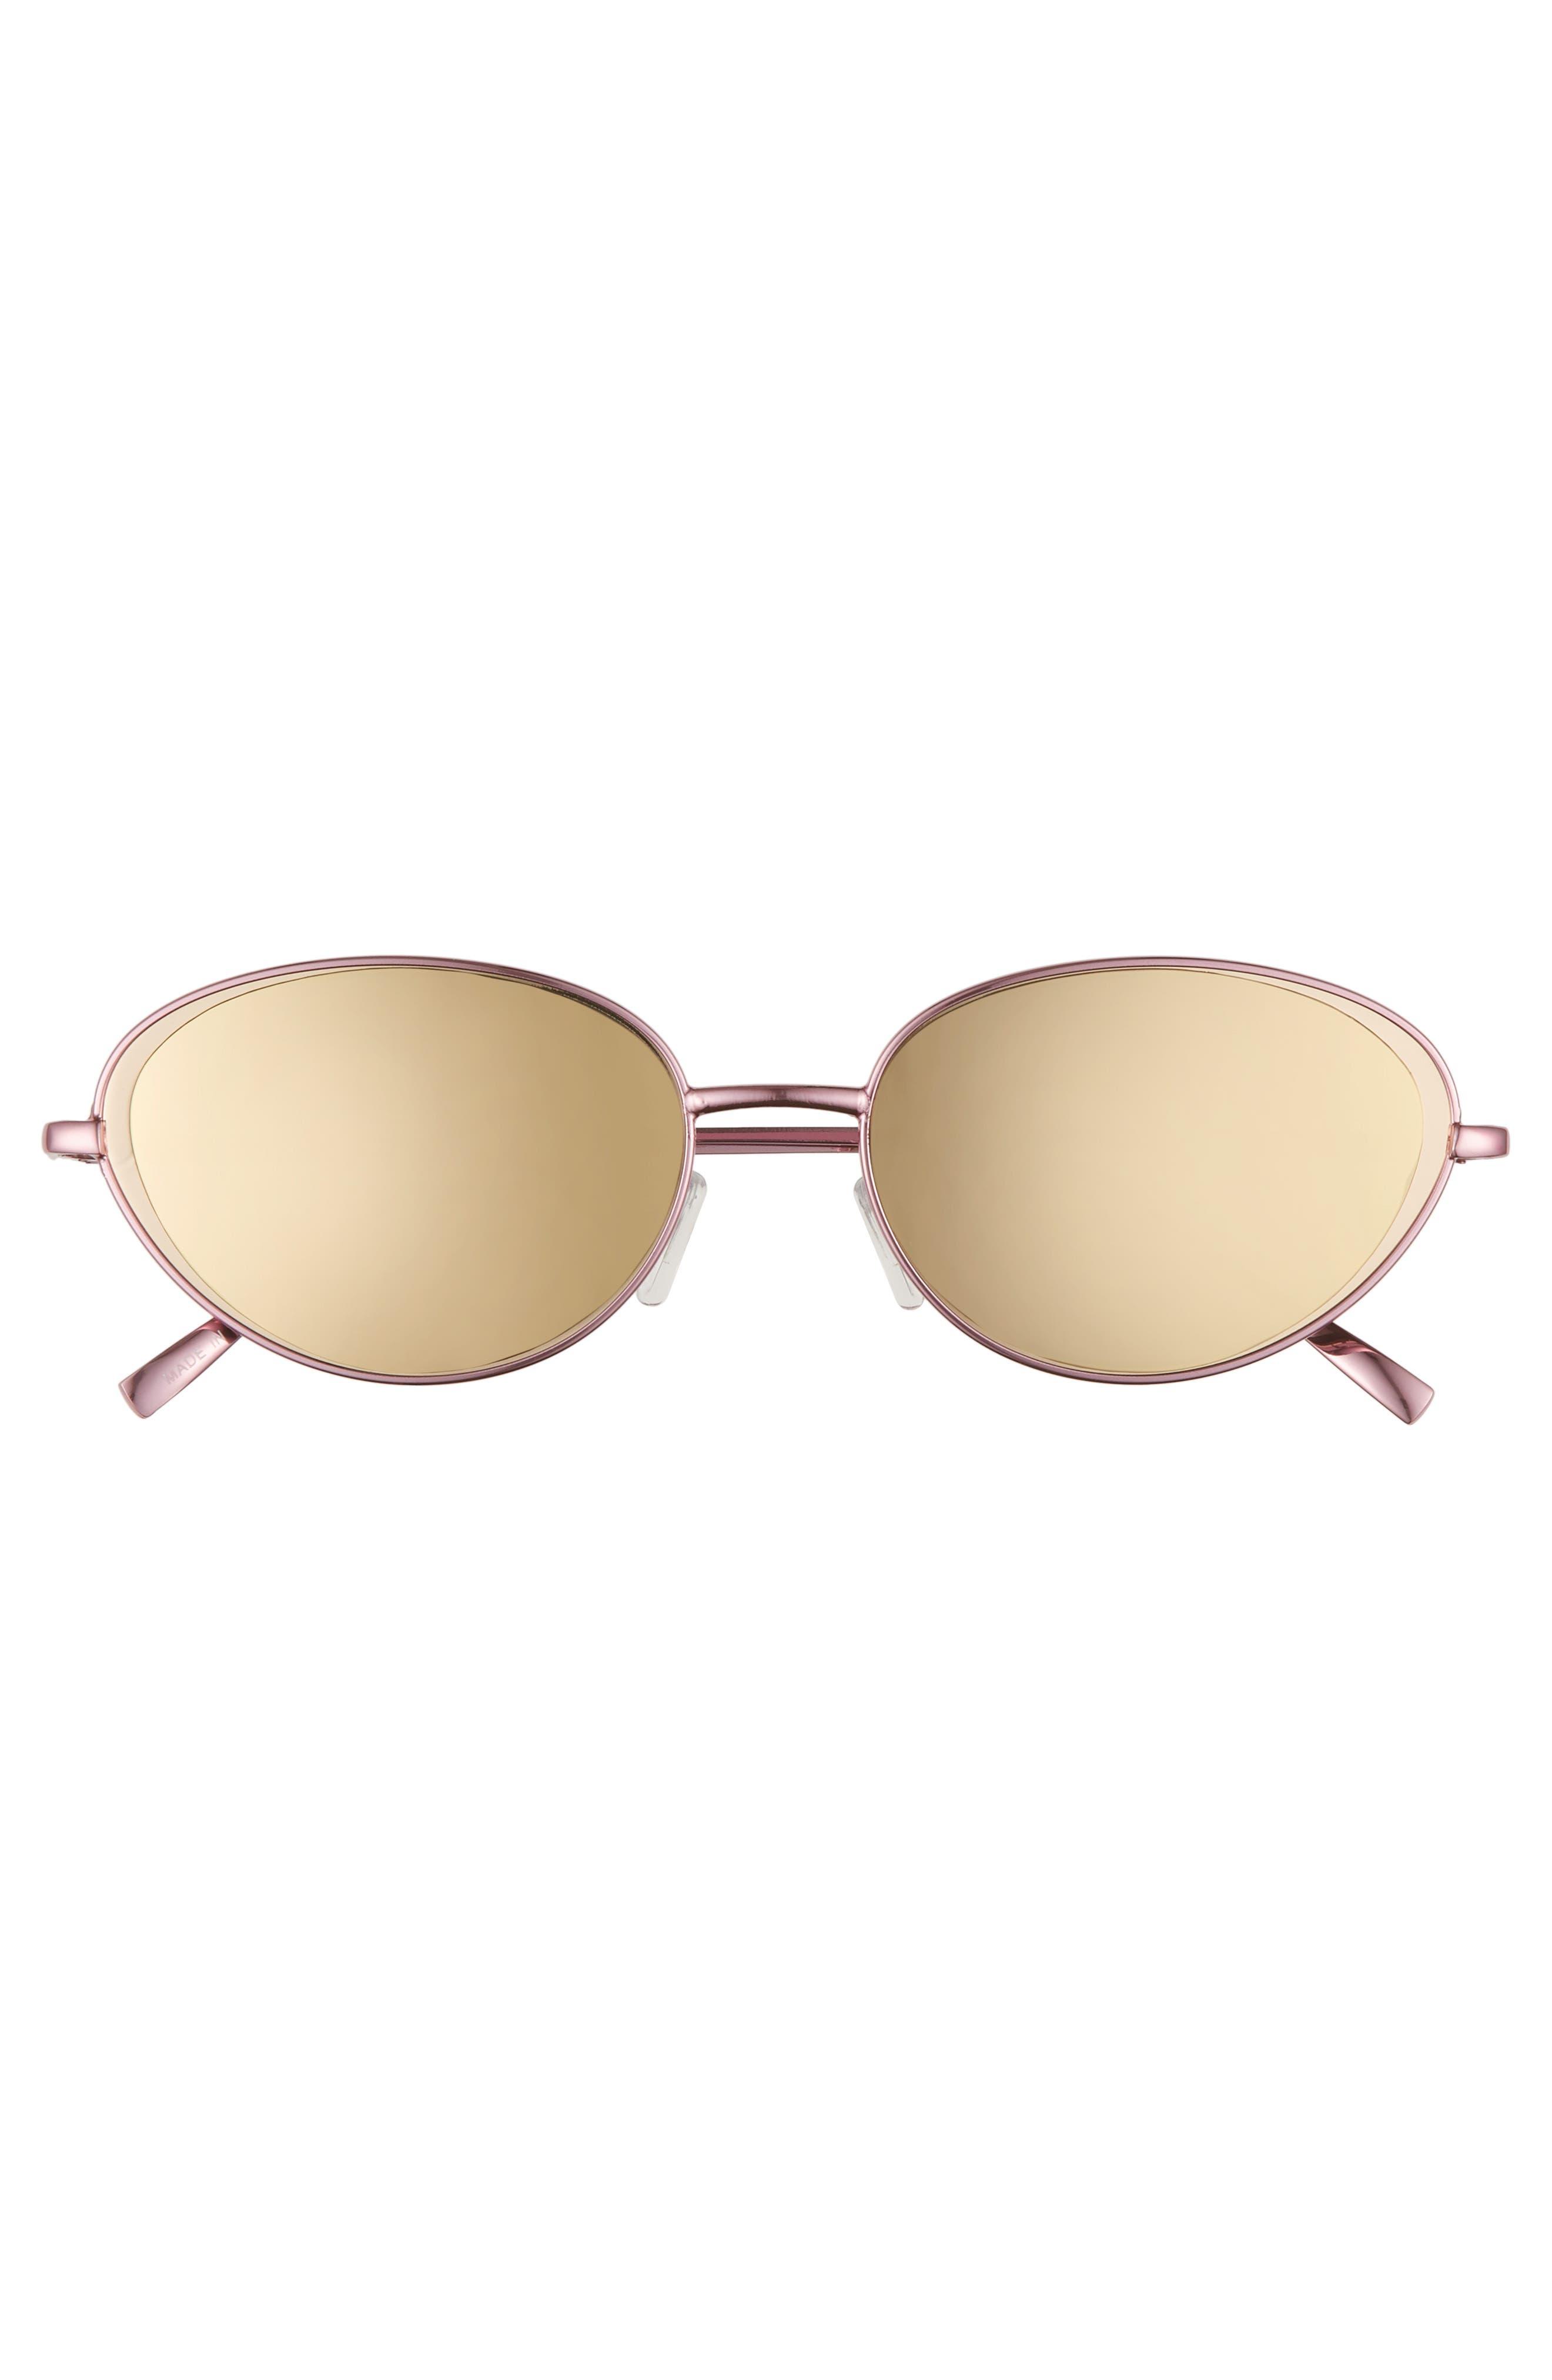 57mm Oval Sunglasses,                             Alternate thumbnail 3, color,                             650